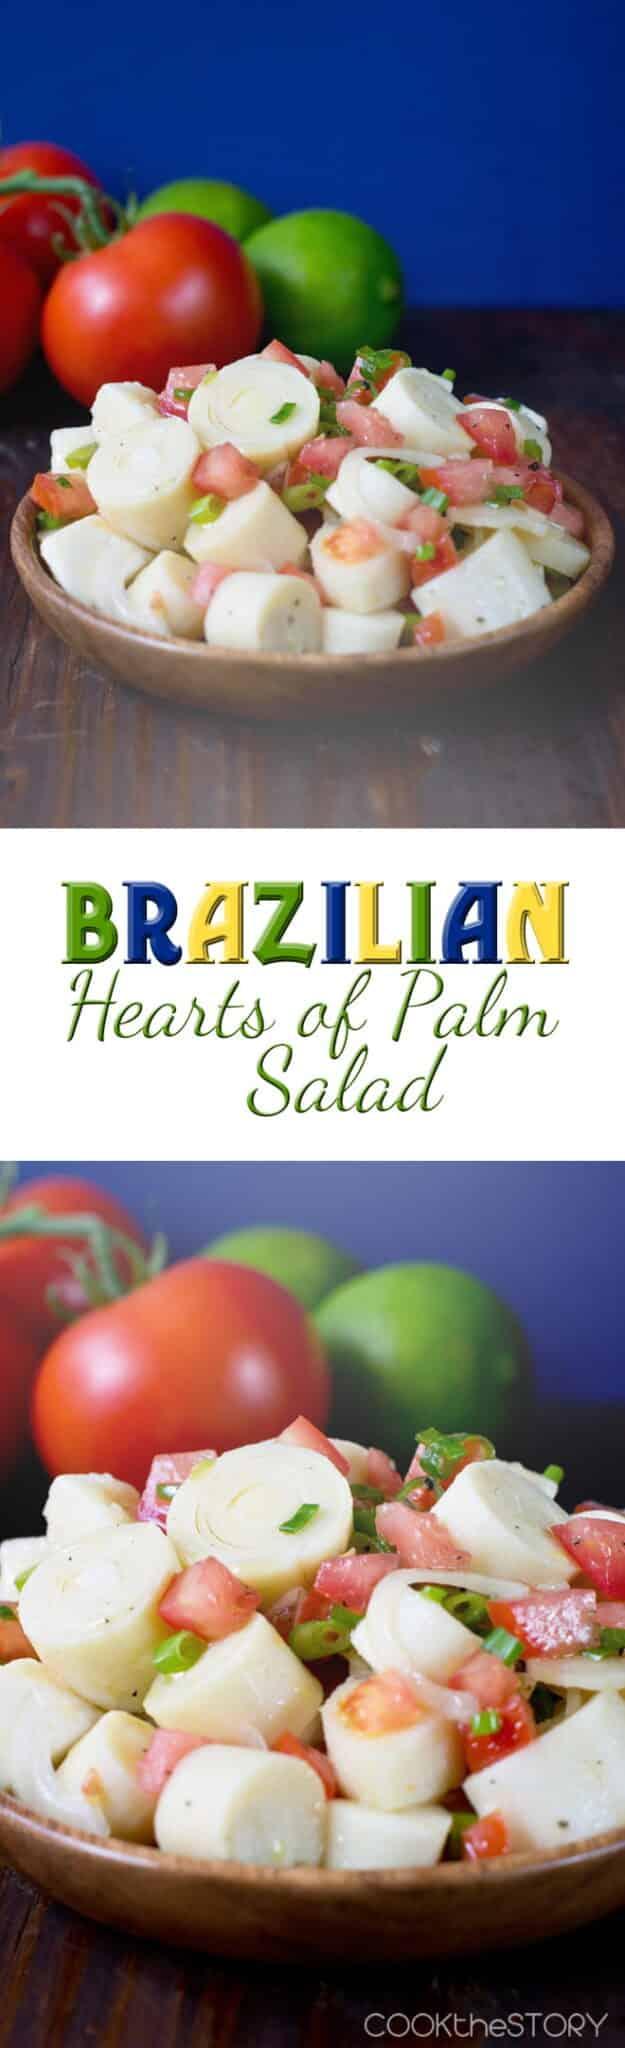 Brazilian Hearts of Palm Salad